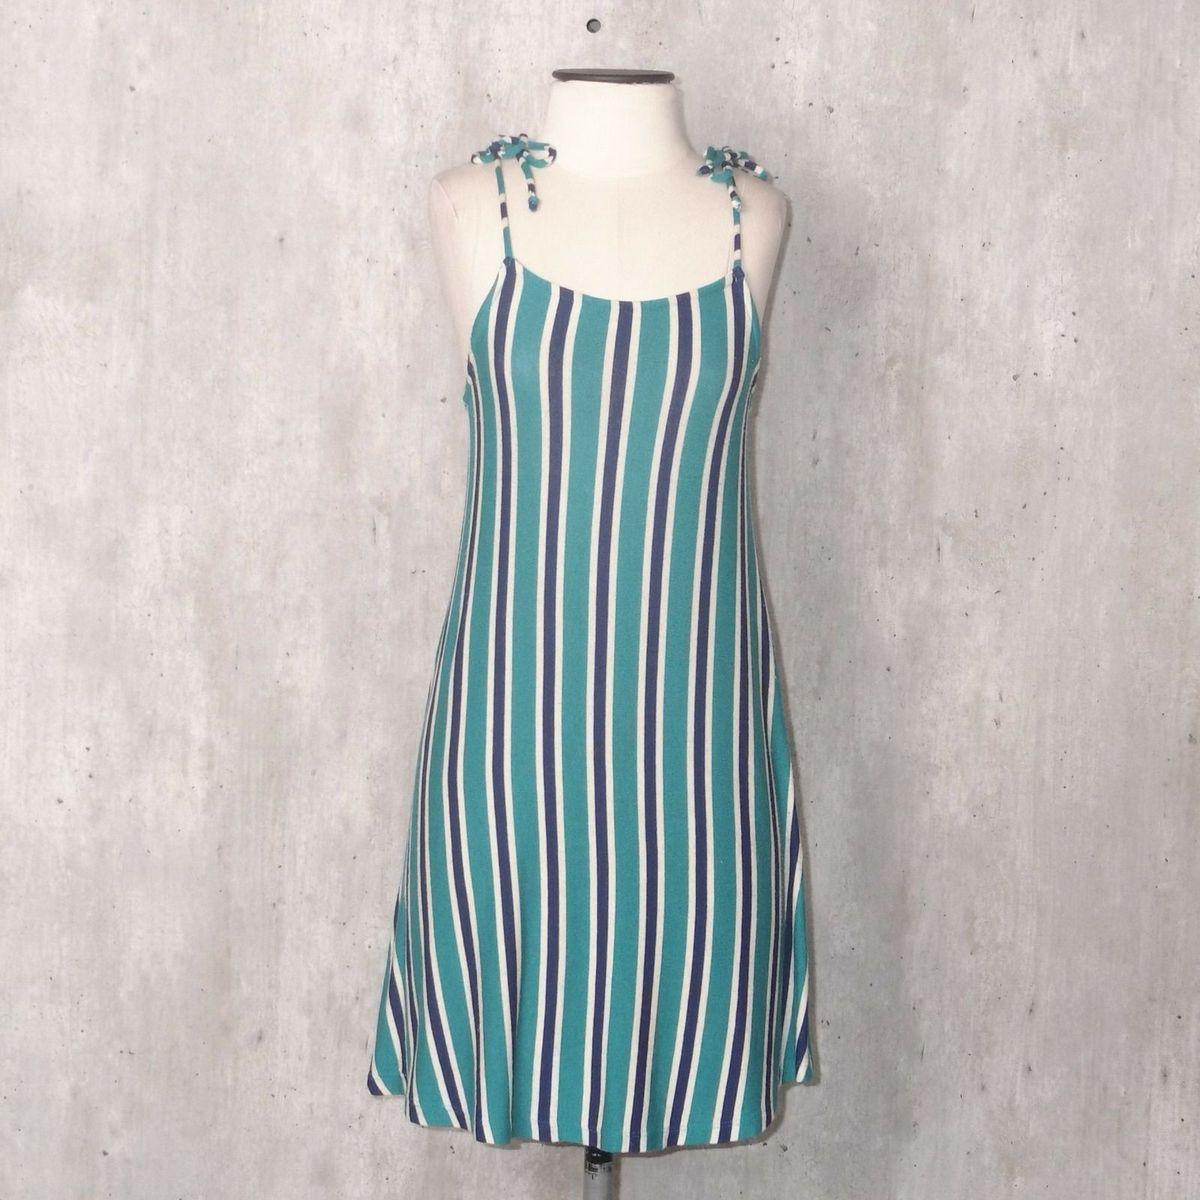 289f63db8c493 vestido verde listrado - vestidos zara.  Czm6ly9wag90b3muzw5qb2vplmnvbs5ici9wcm9kdwn0cy83mzk0mtqxl2u4owjjy2rlmzu0nzm4mji4mdnknmnkzji2mta2oti5lmpwzw  ...